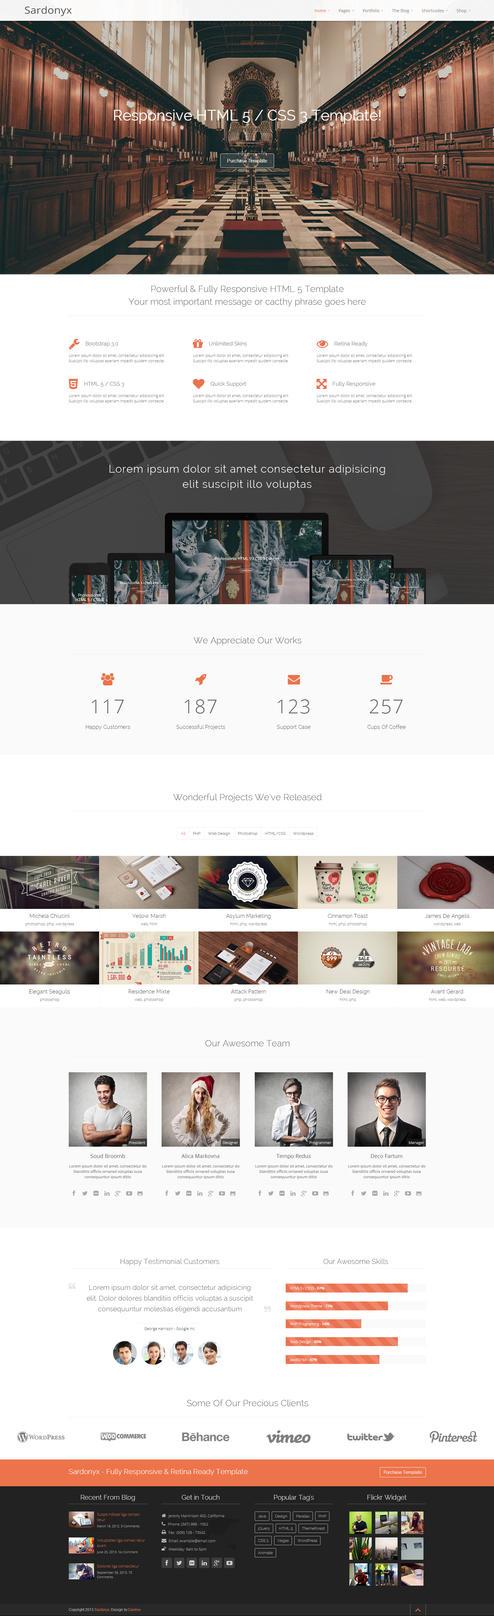 sardonyx fully responsive business template by darkstalkerr on deviantart. Black Bedroom Furniture Sets. Home Design Ideas